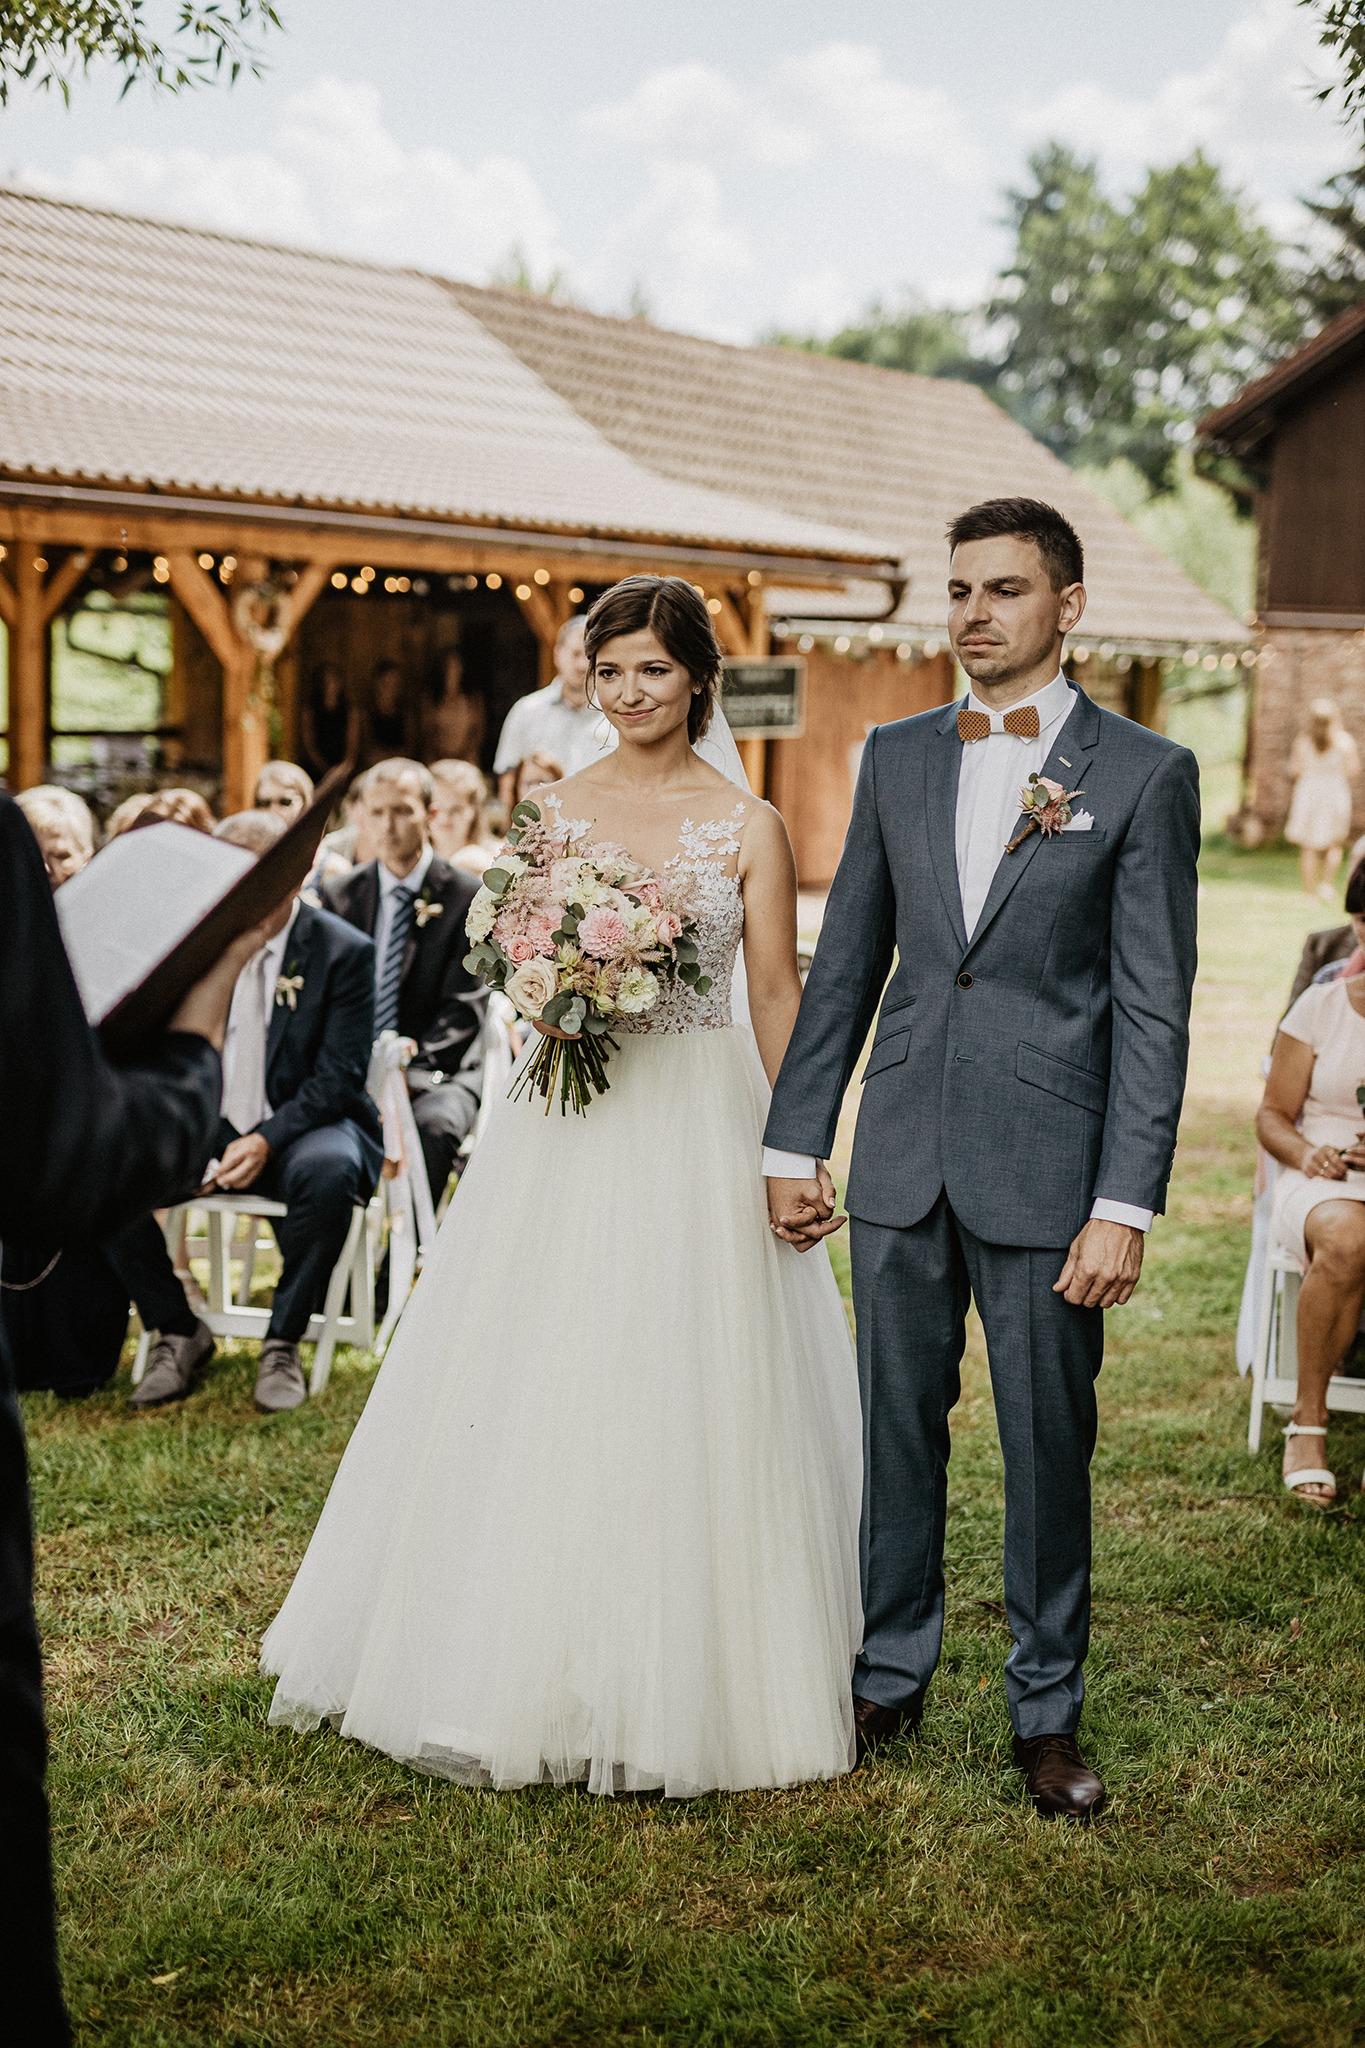 obřad svatba jičín fotograf